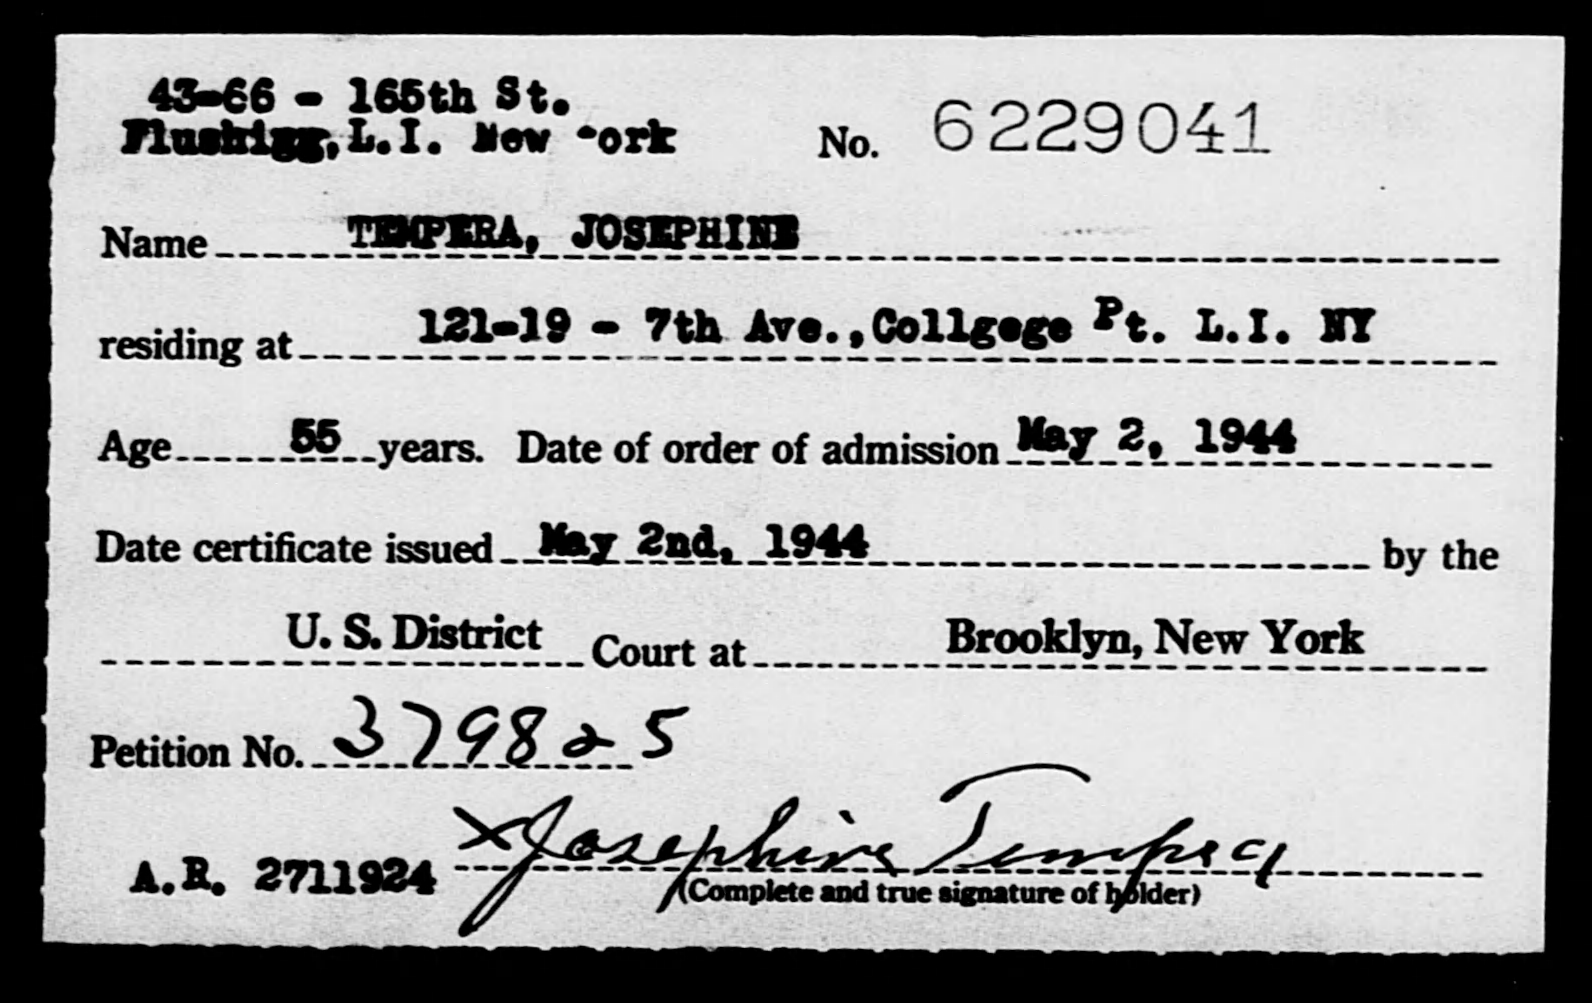 TEMPERA, JOSEPHINE - Born: [BLANK], Naturalized: 1944